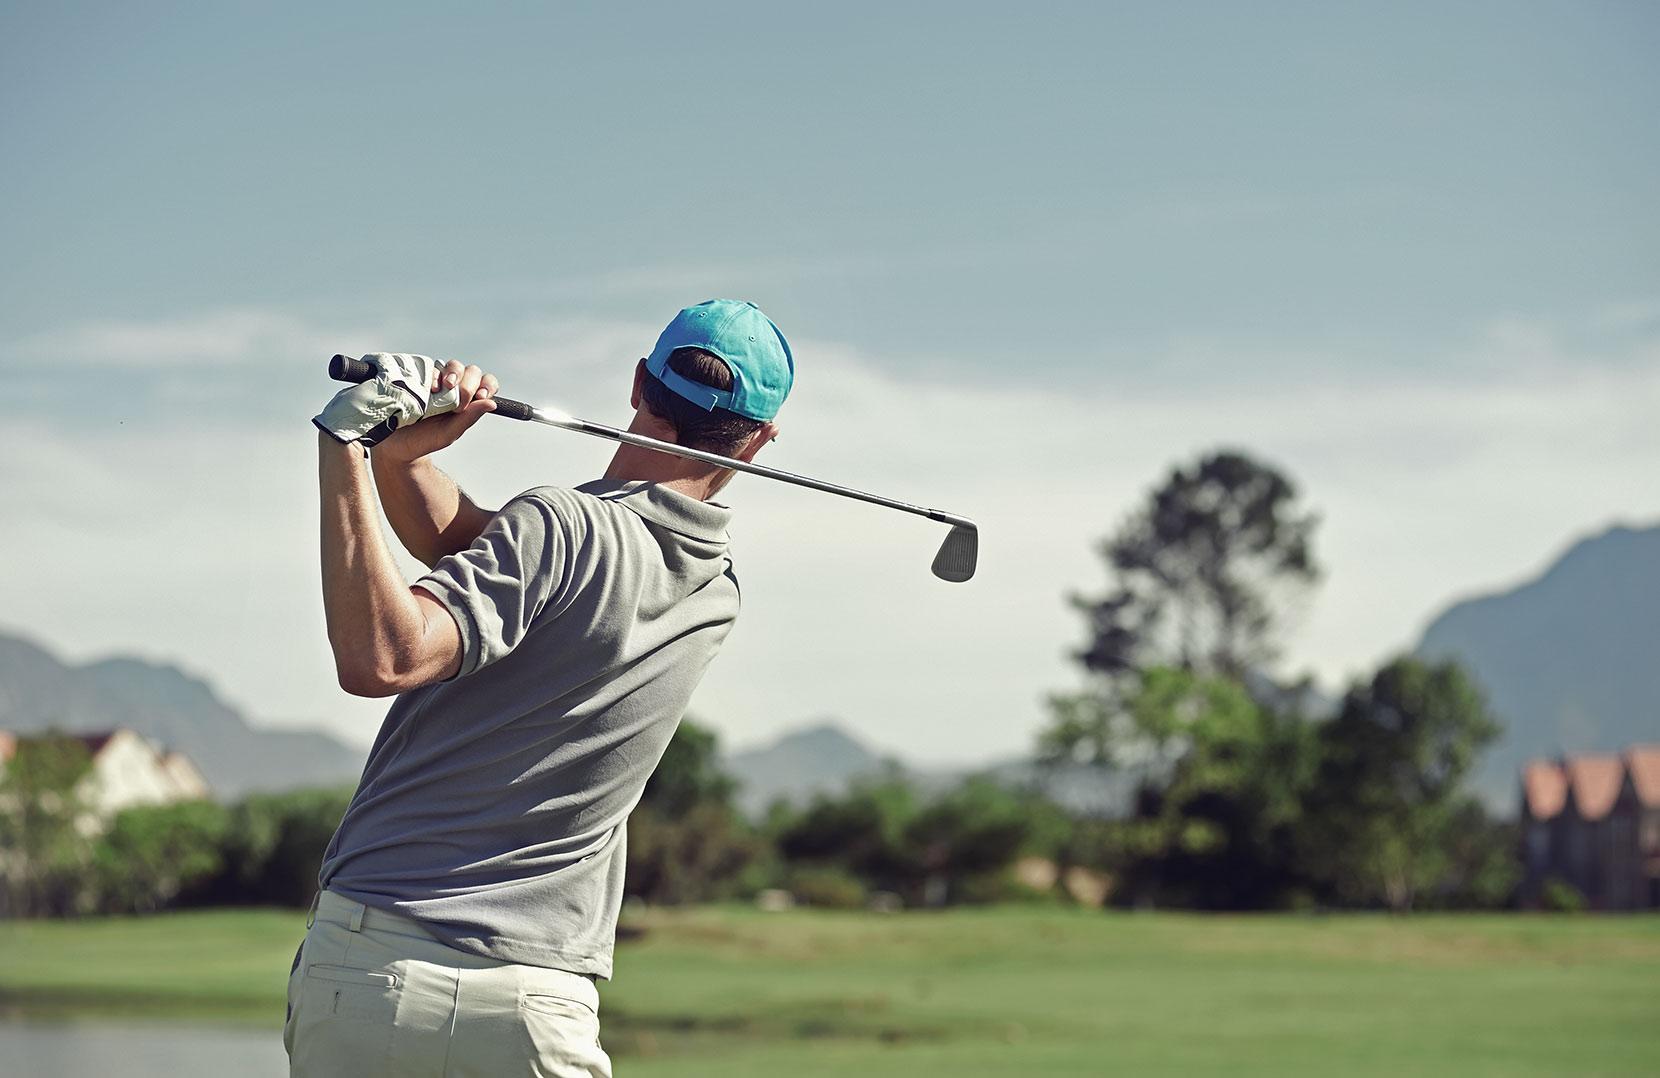 Alpine Golf Player